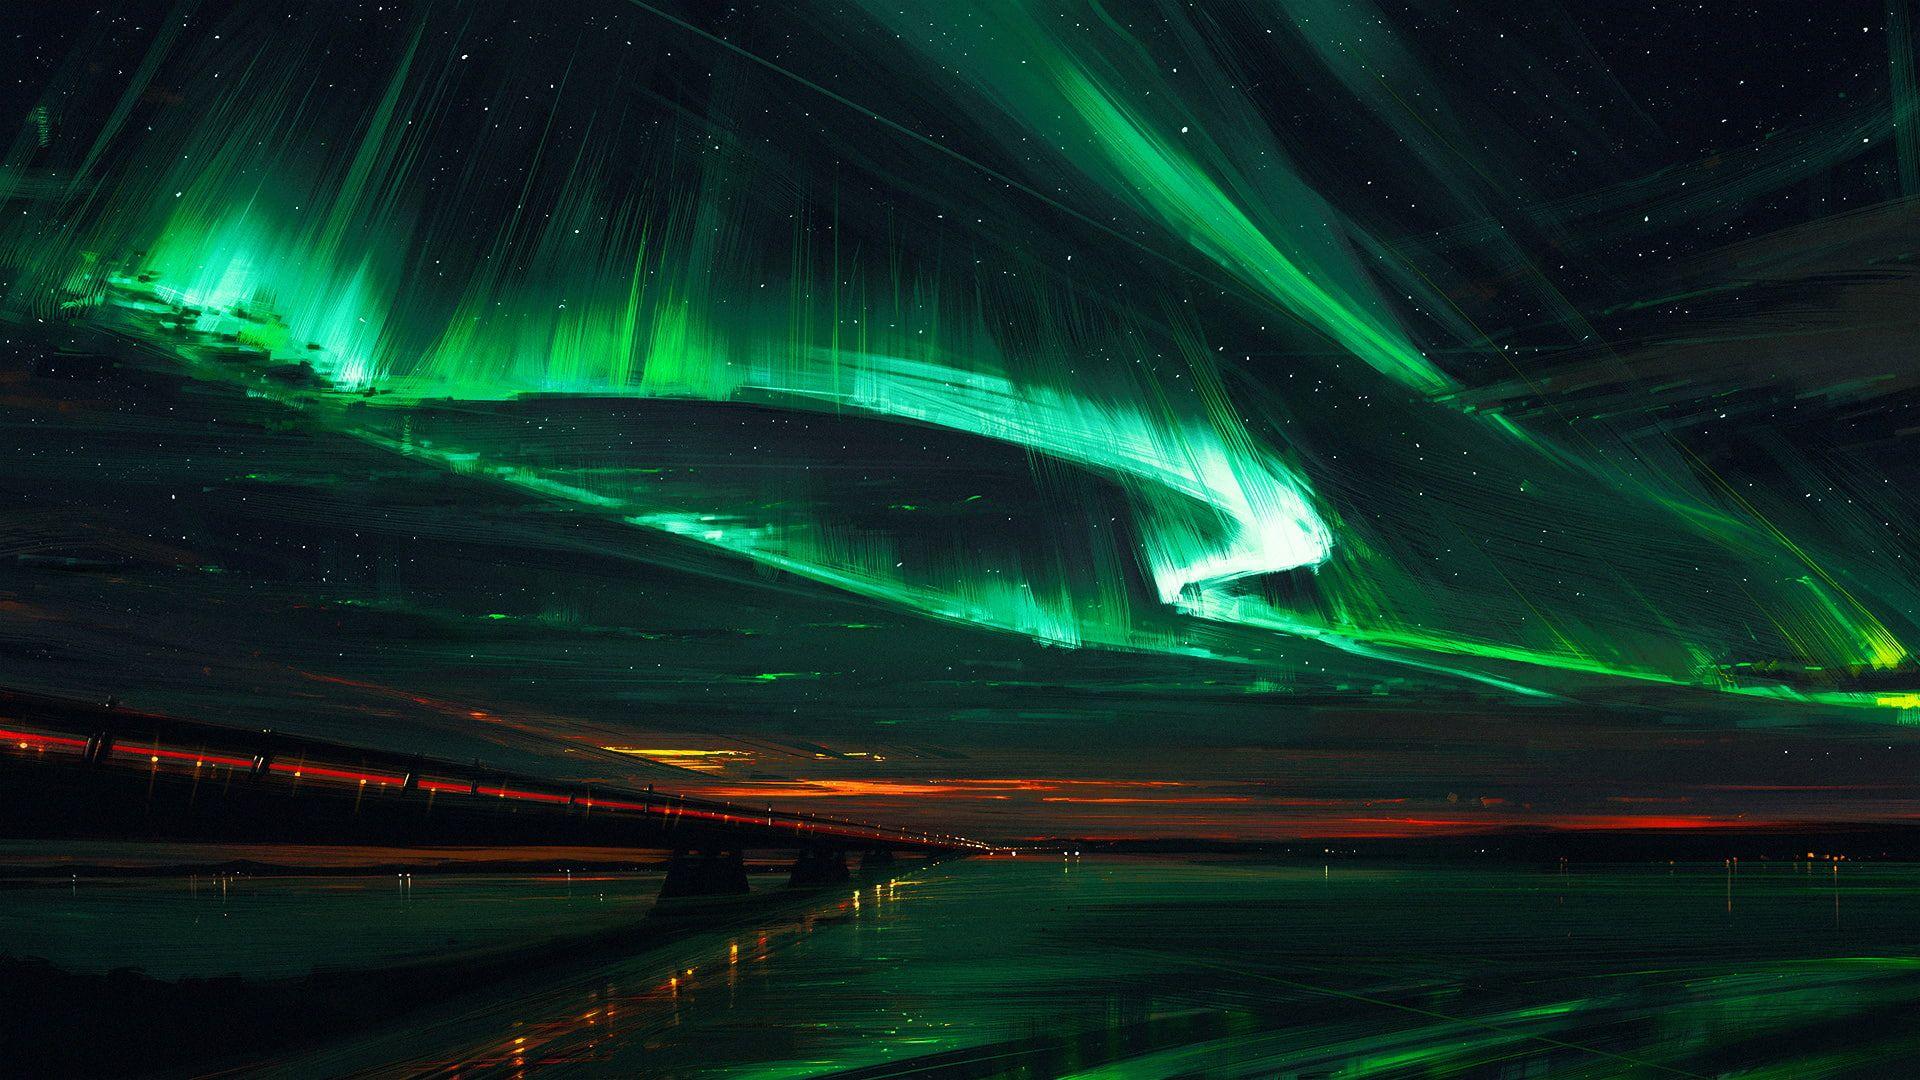 Northern Lights By Alena Aenami 1080p Wallpaper Hdwallpaper Desktop In 2020 Northern Lights Wallpaper Northern Lights Northern Lights Art